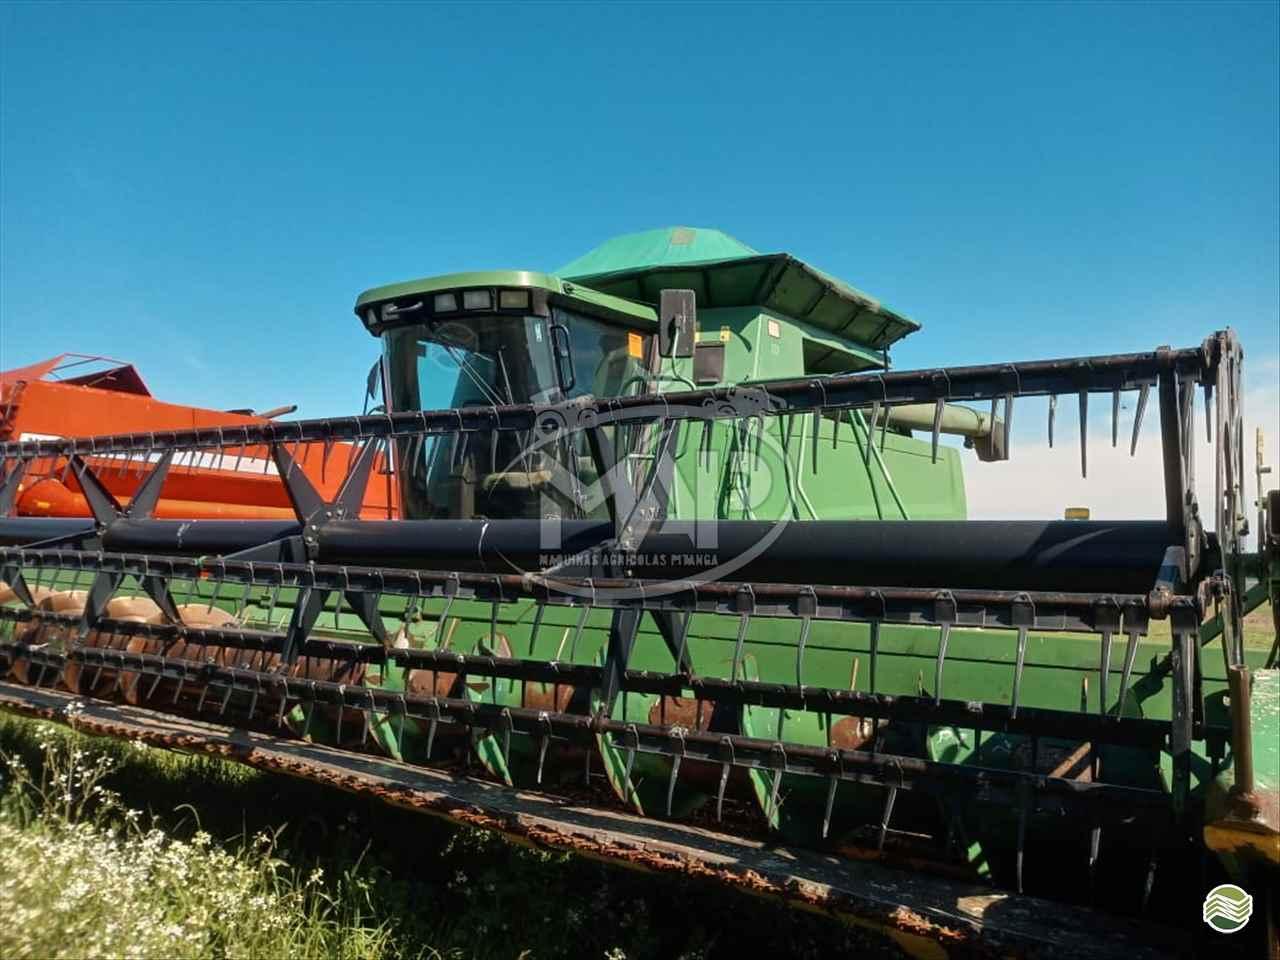 COLHEITADEIRA JOHN DEERE JOHN DEERE 9650 STS Máquinas Agrícolas Pitanga PITANGA PARANÁ PR